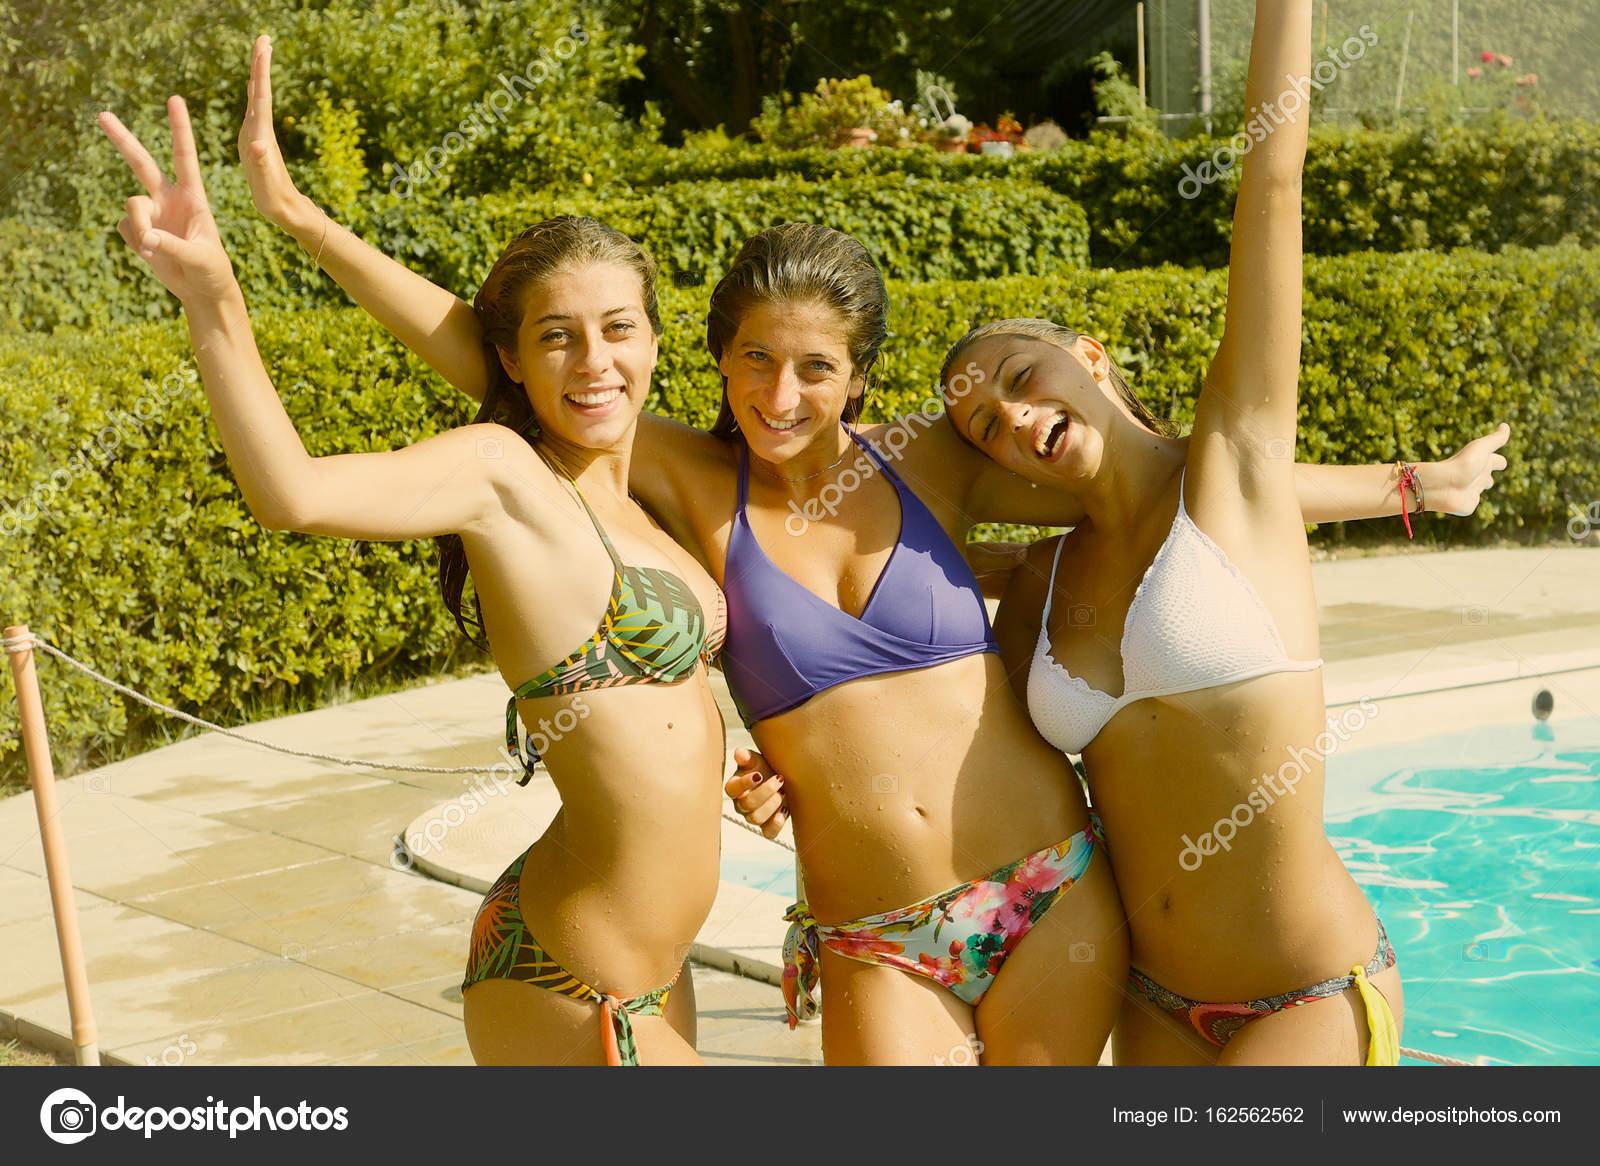 junge geile girls